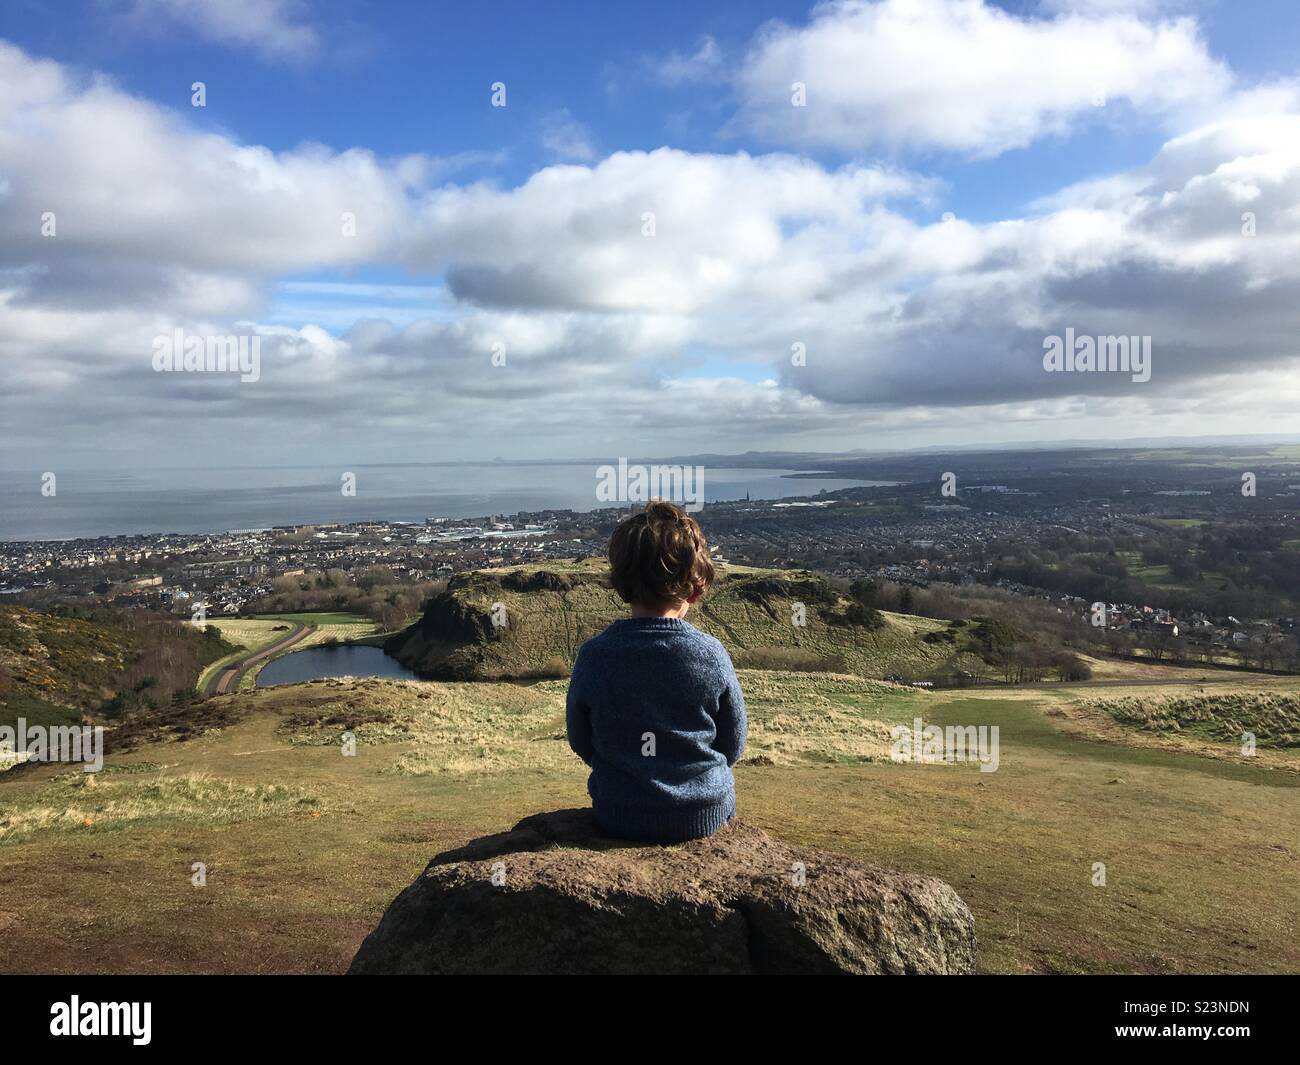 Menino sentado em Arthur's Seat, Edimburgo Imagens de Stock